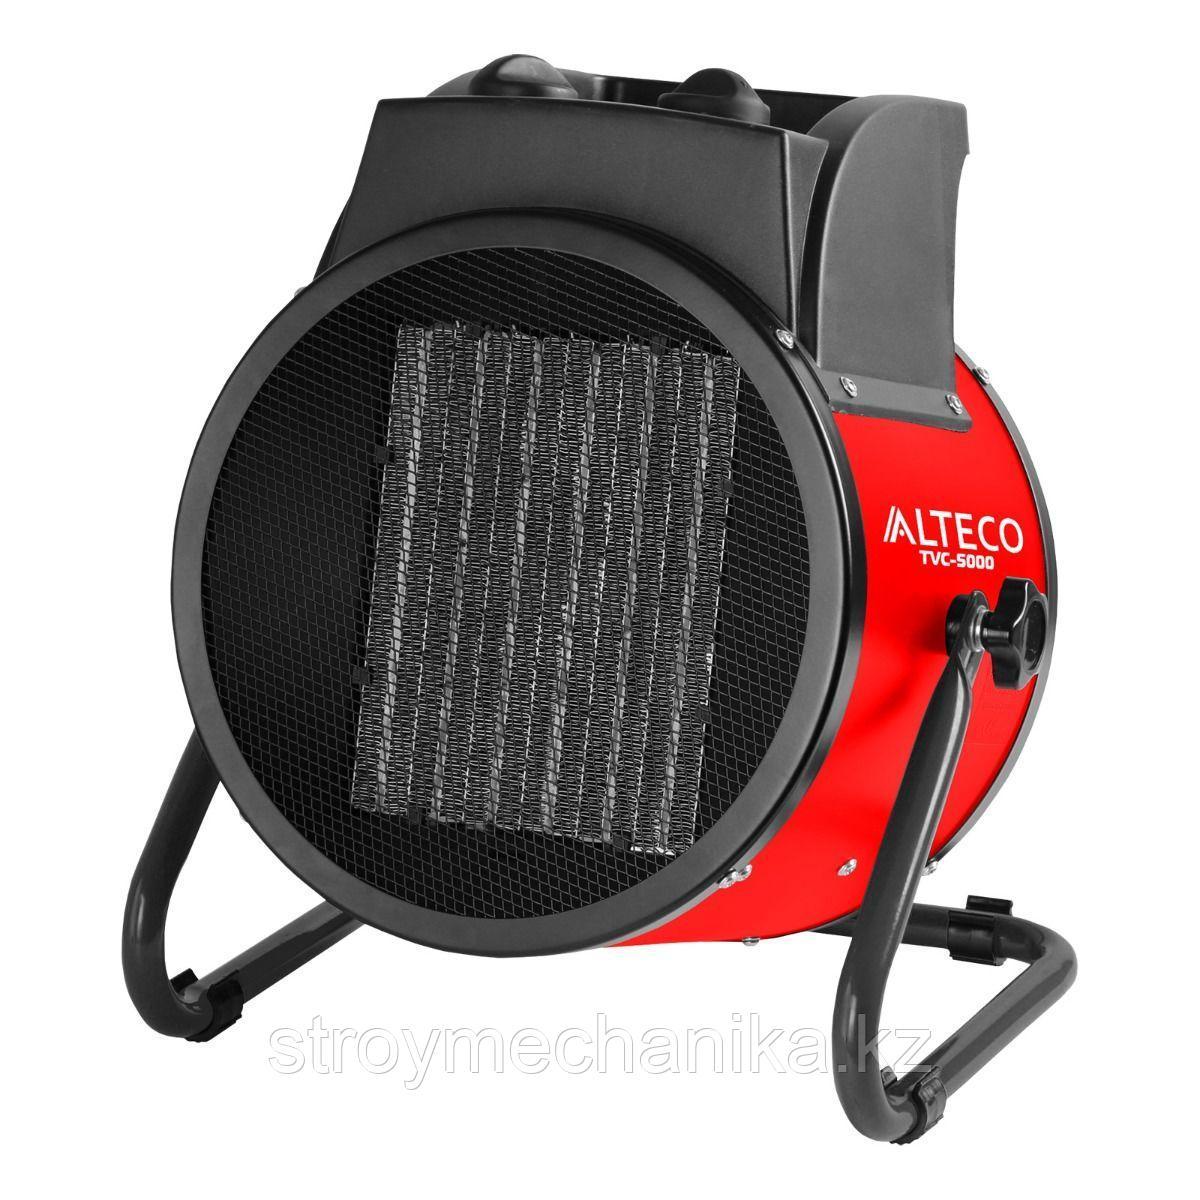 Тепловентилятор TVC-5000 (5кВт) ALTECO